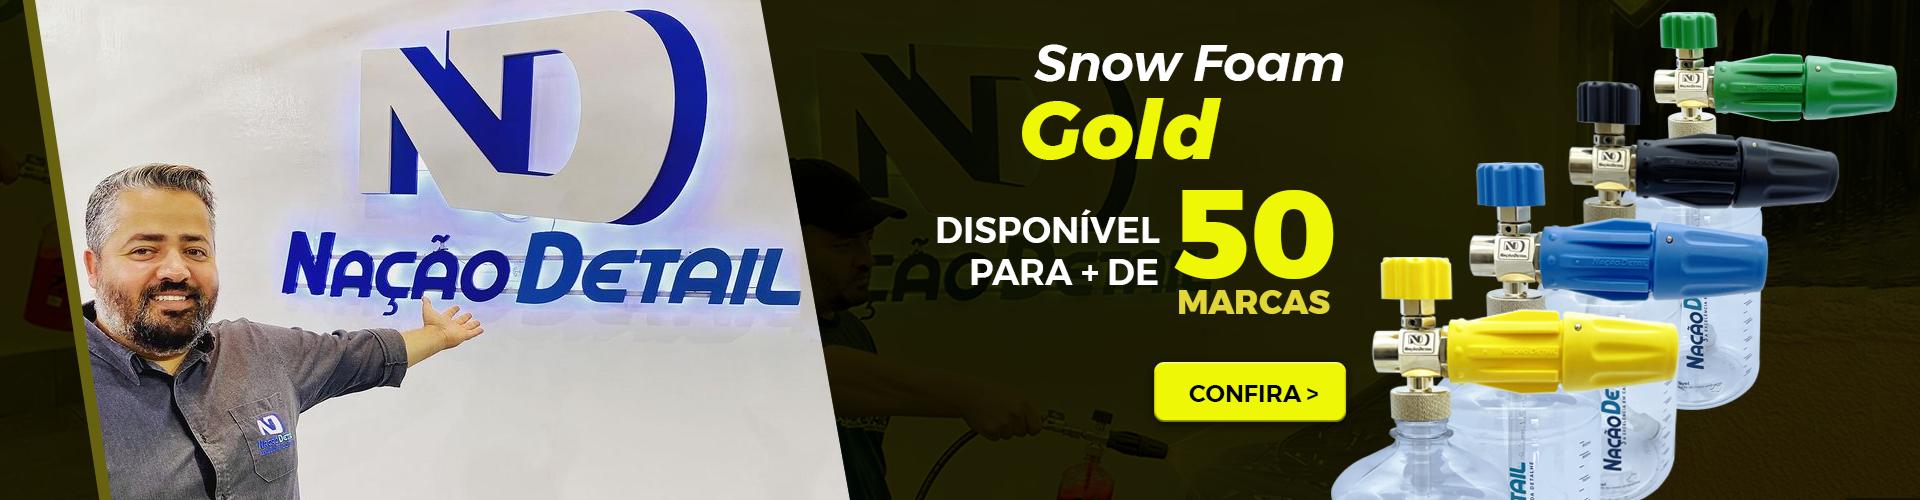 Snow Foam Gold